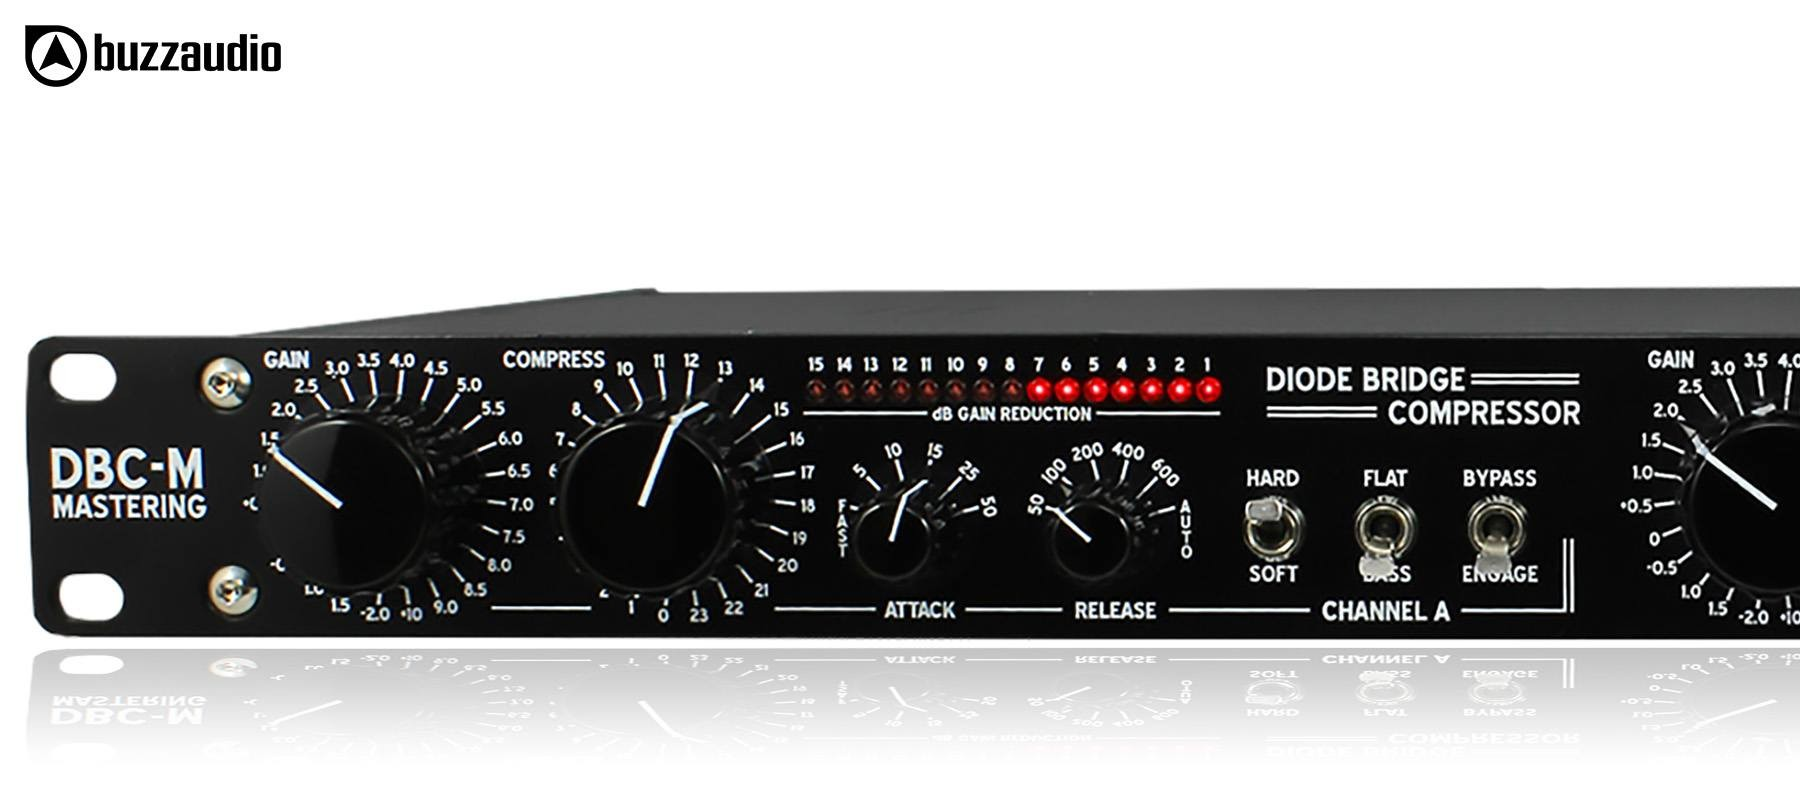 Buzz Audio DBC-M - Left commands